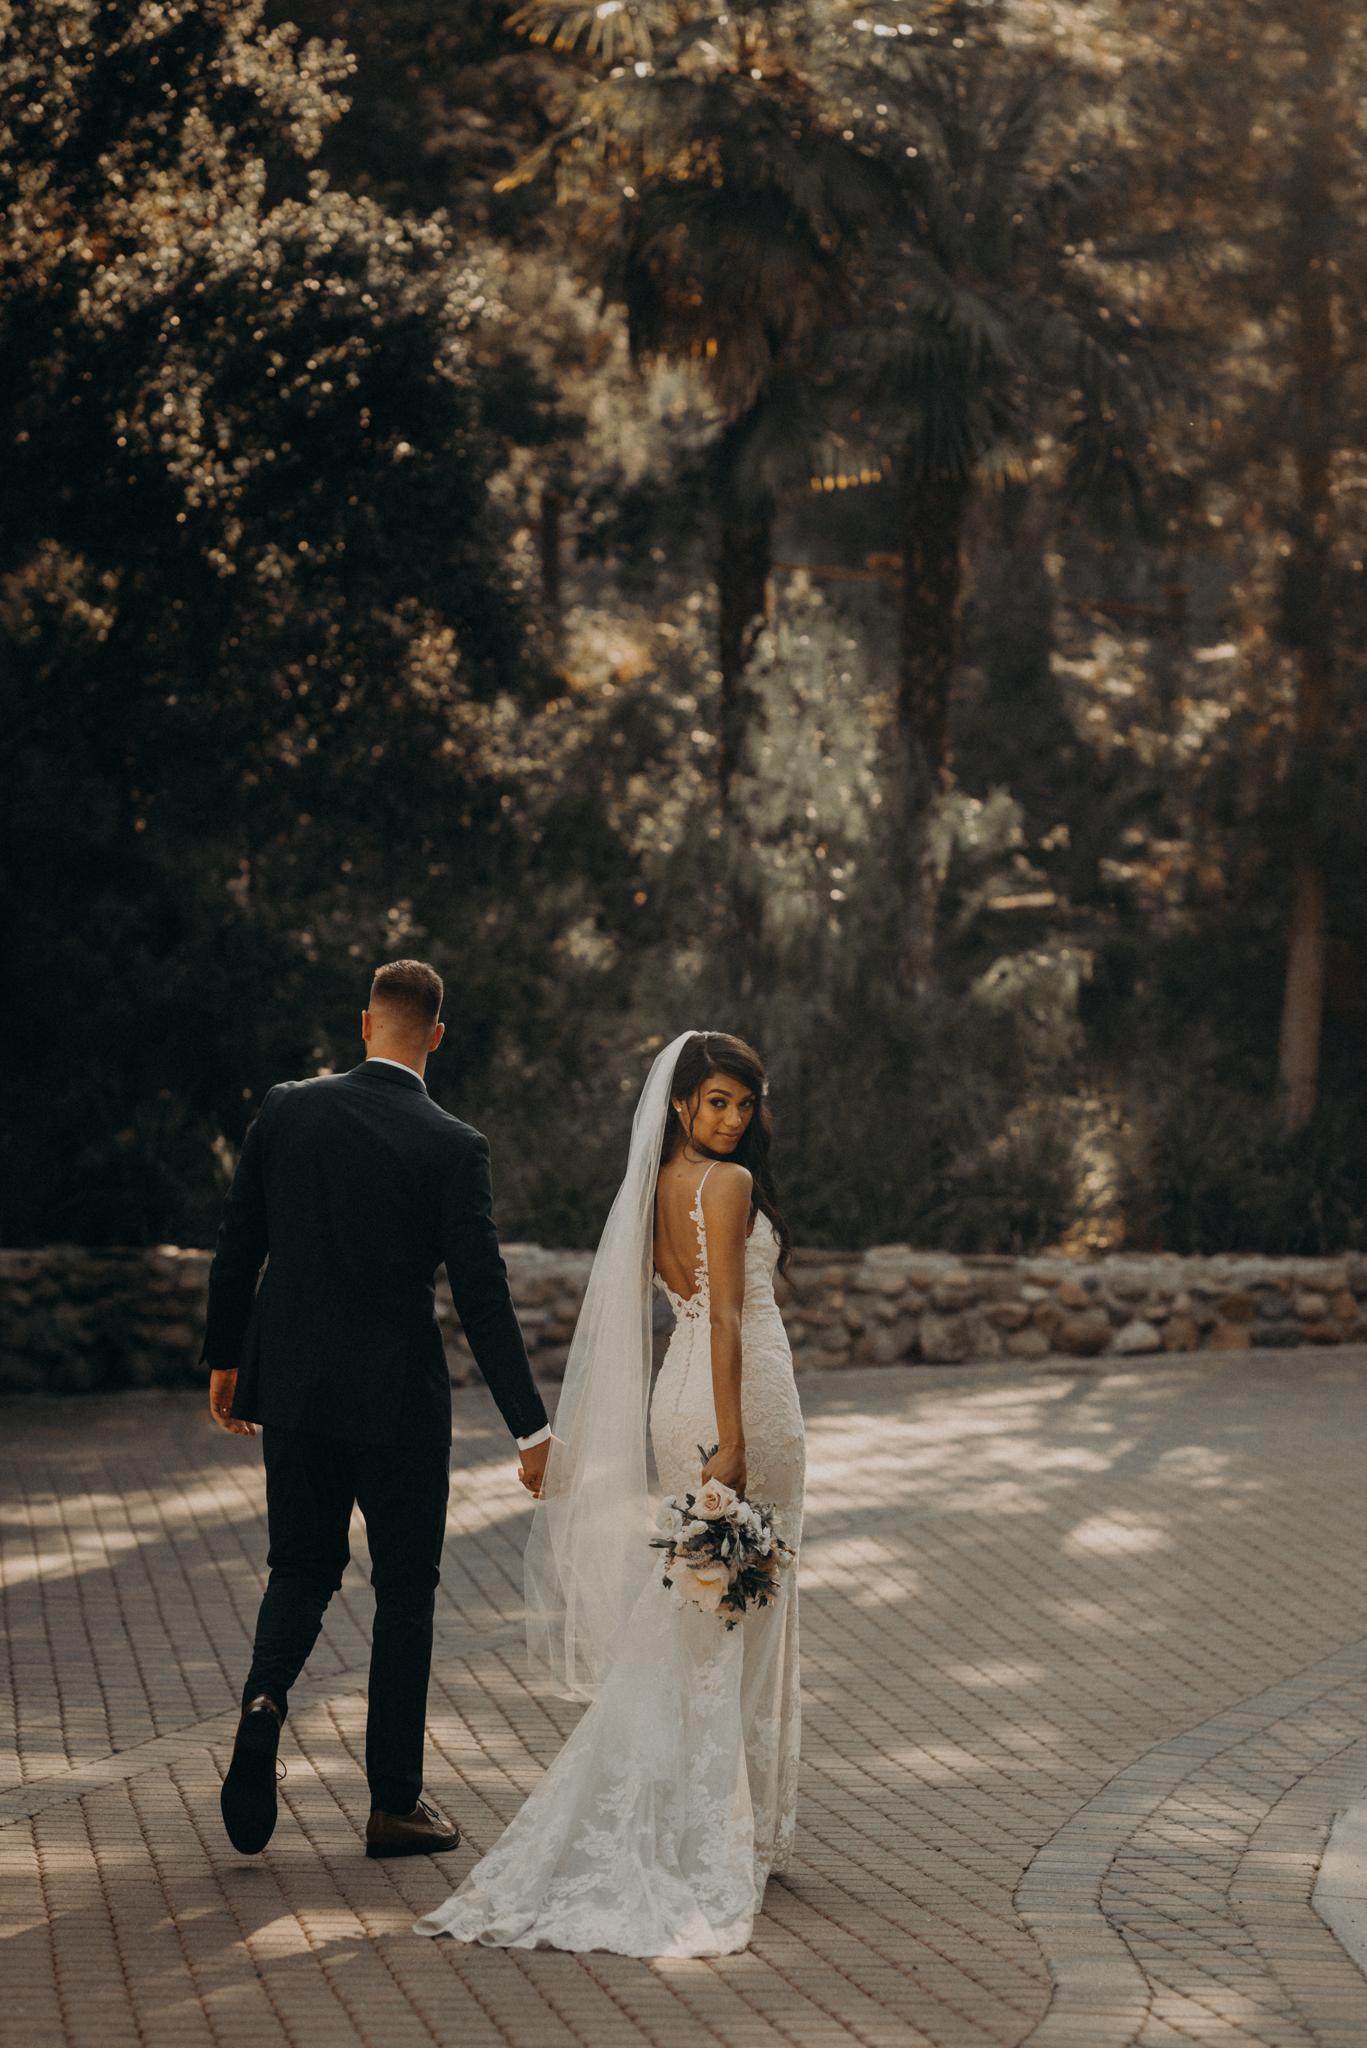 Isaiah + Taylor Photography - Rancho Las Lomas Wedding, Los Angeles Wedding Photographer-088.jpg